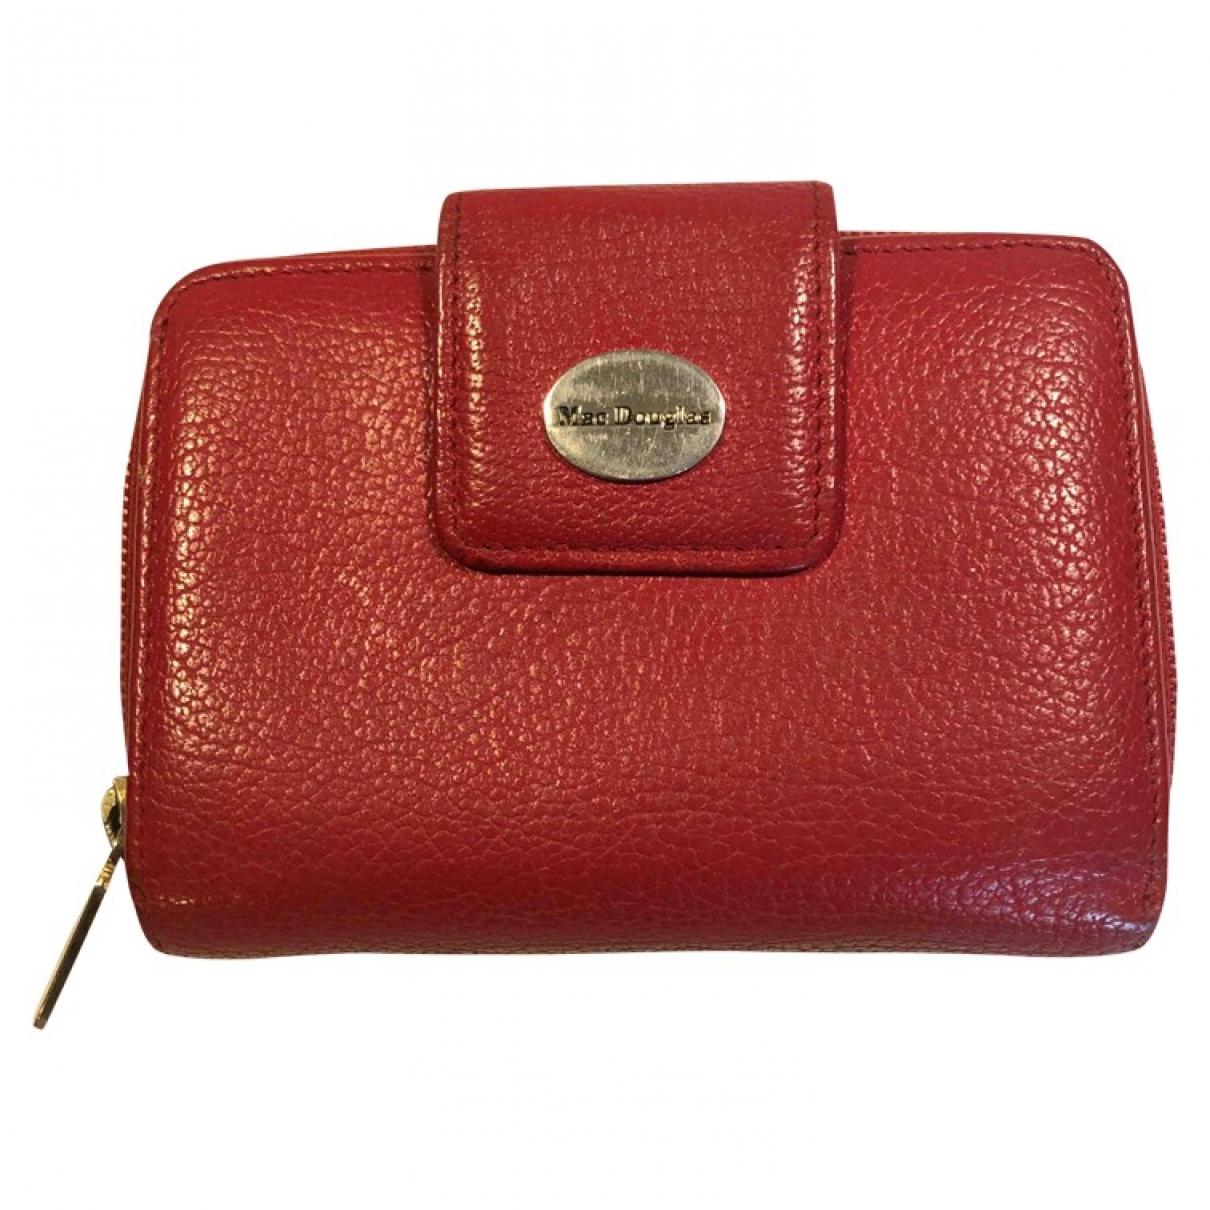 Mac Douglas \N Kleinlederwaren in  Rot Leder